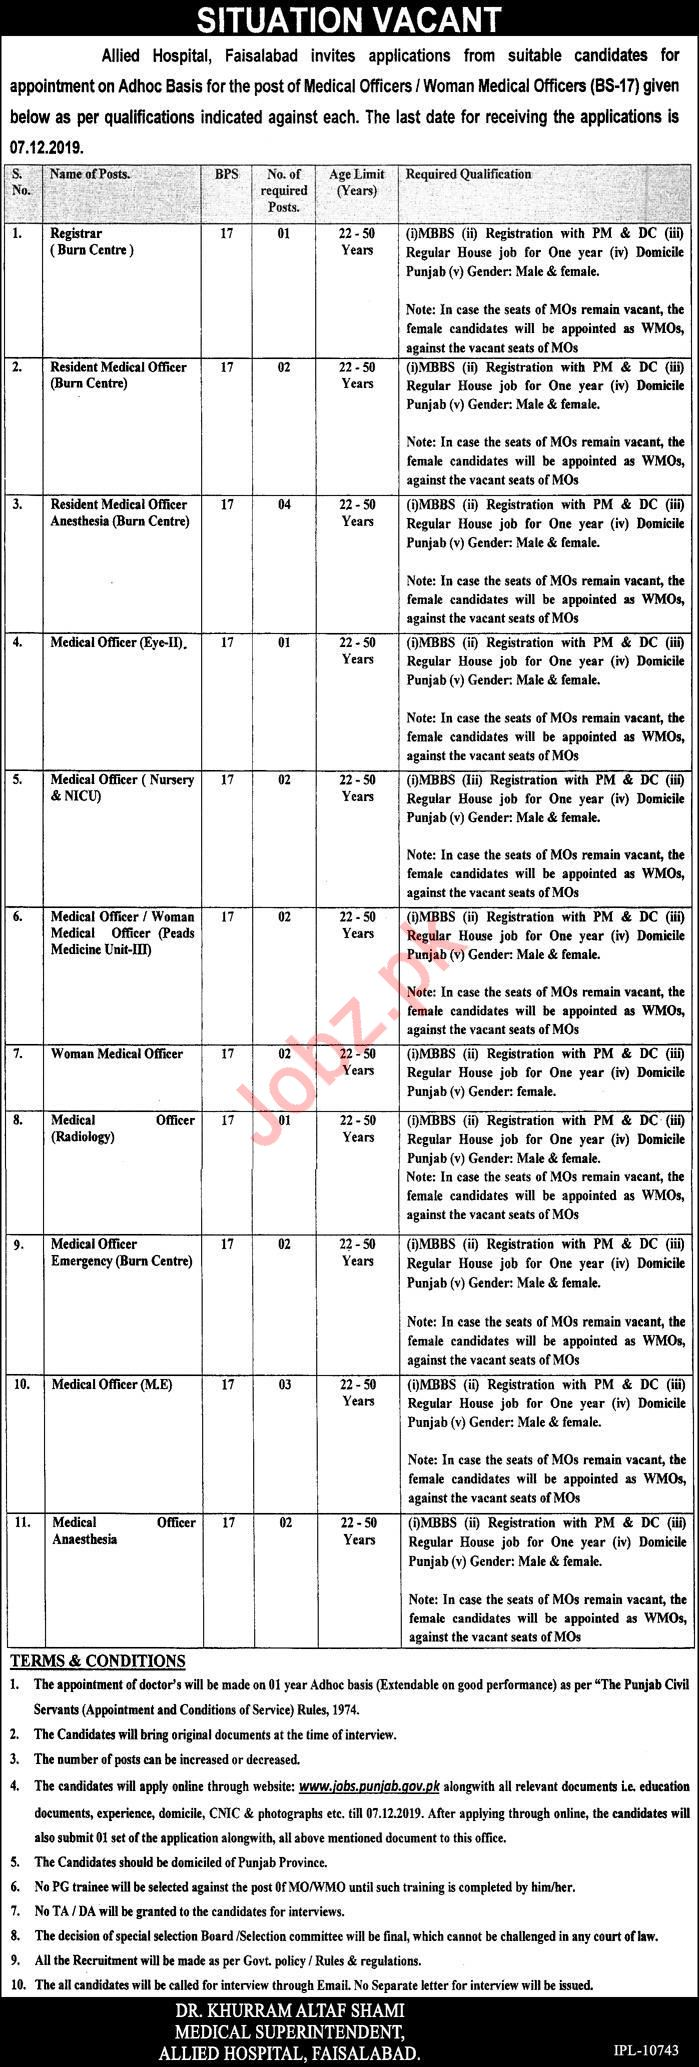 Allied Hospital Faisalabad Jobs 2019